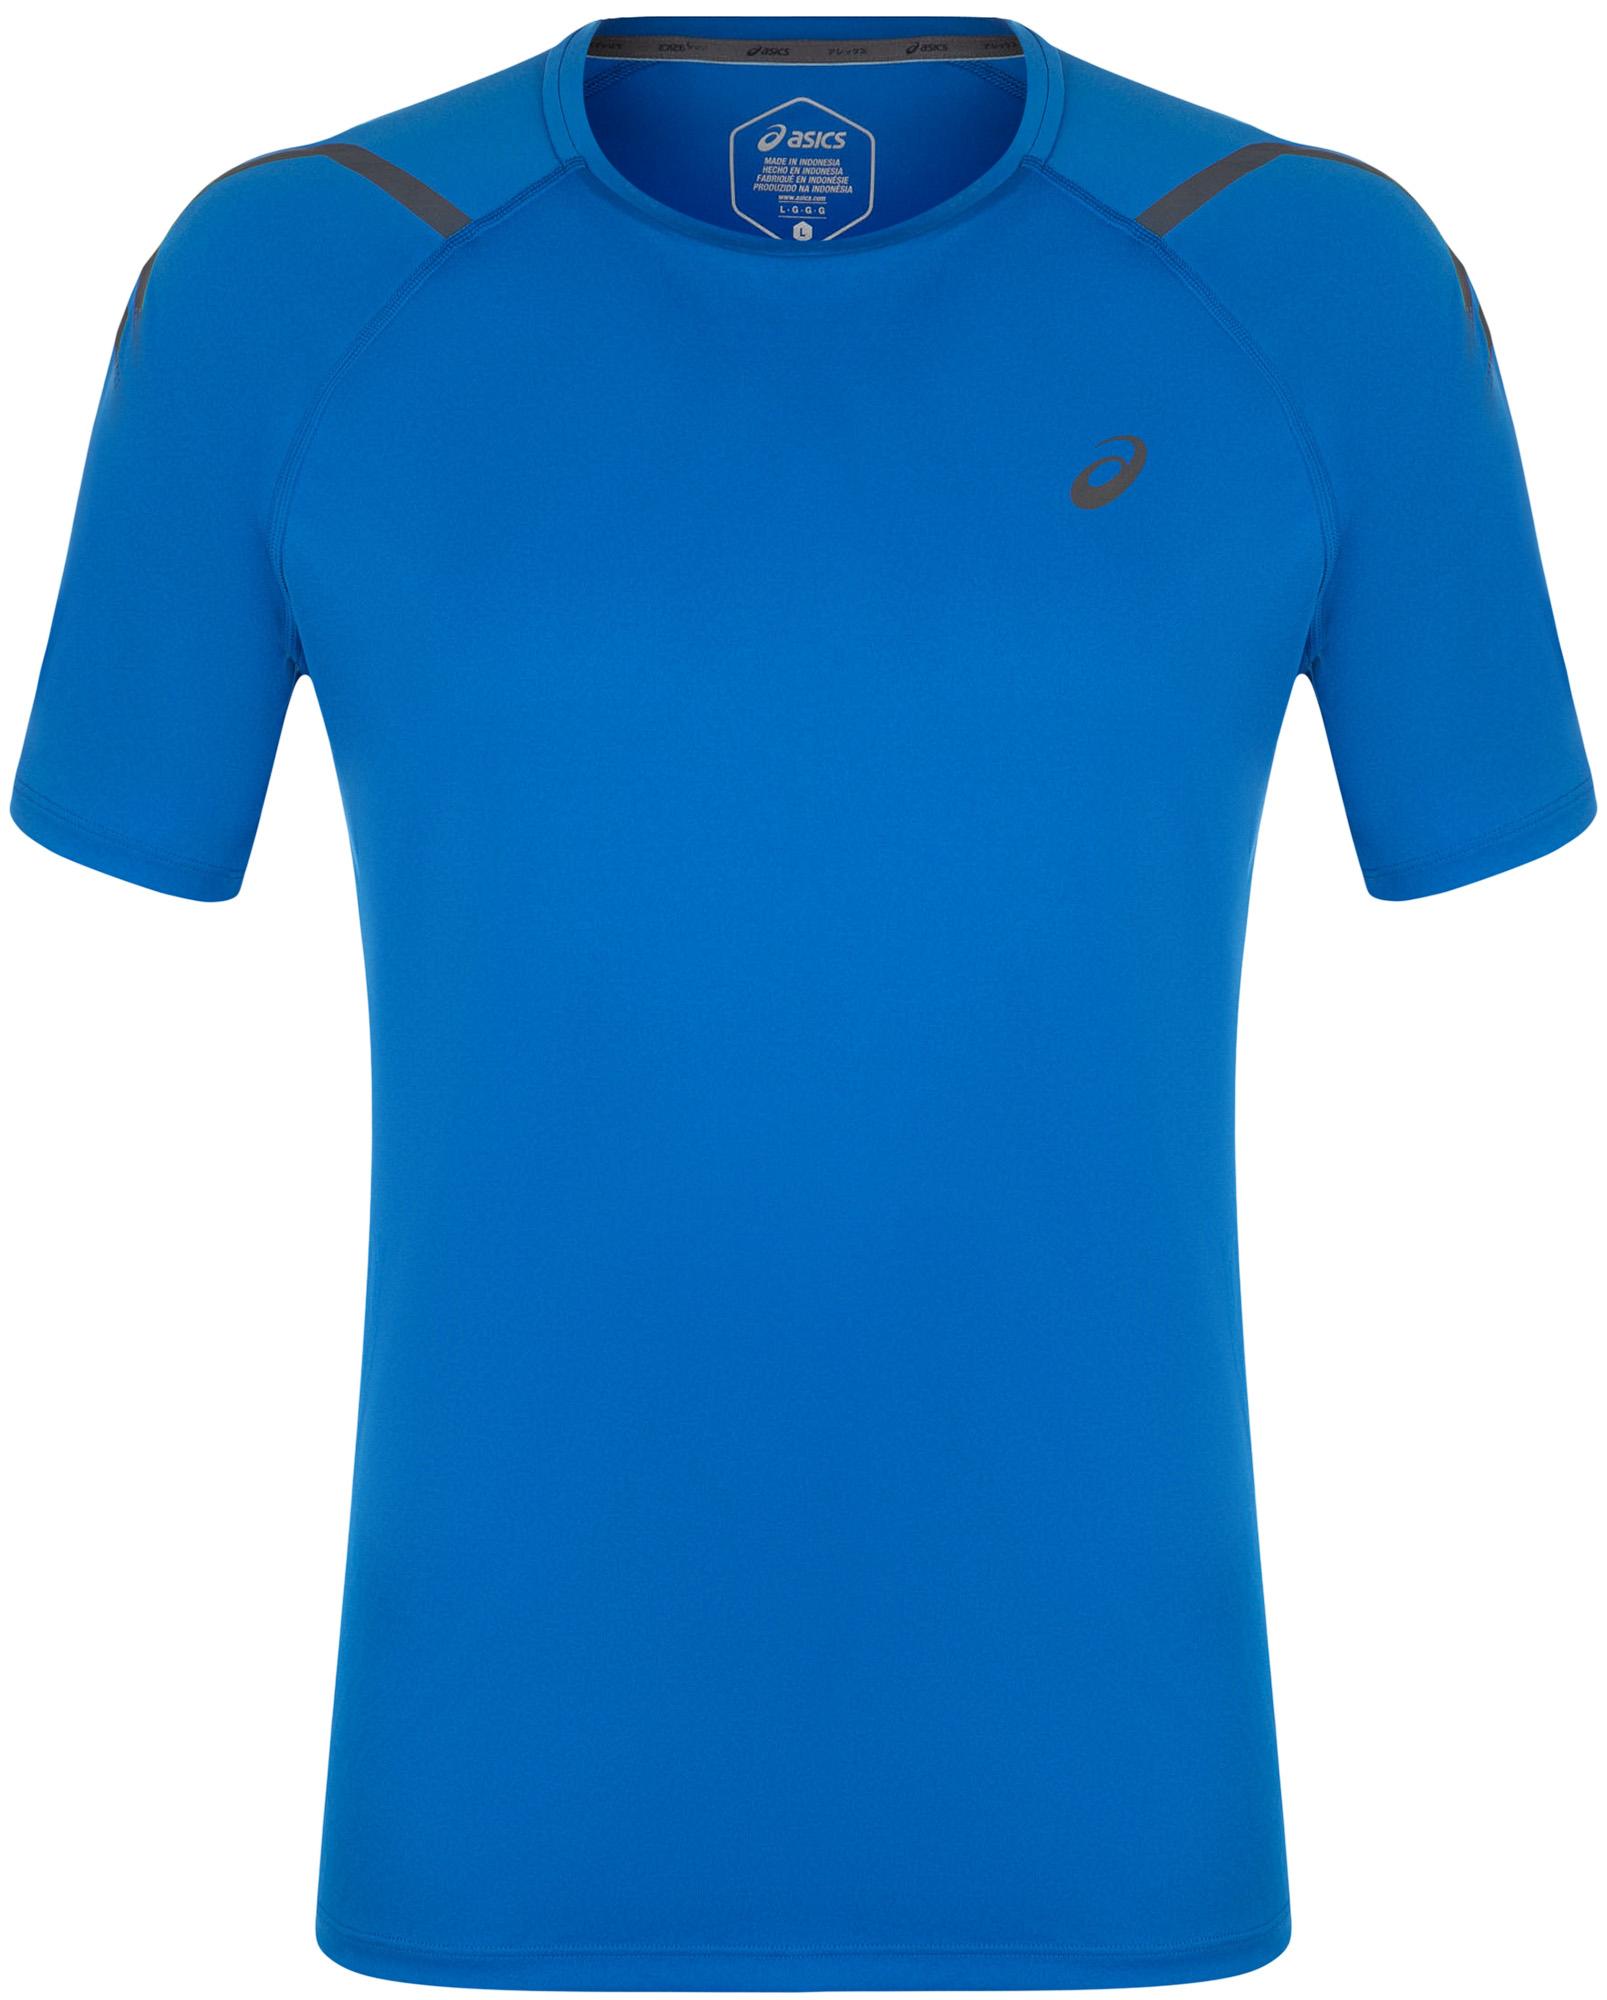 ASICS Футболка мужская ASICS Icon, размер 46-48 цена 2017